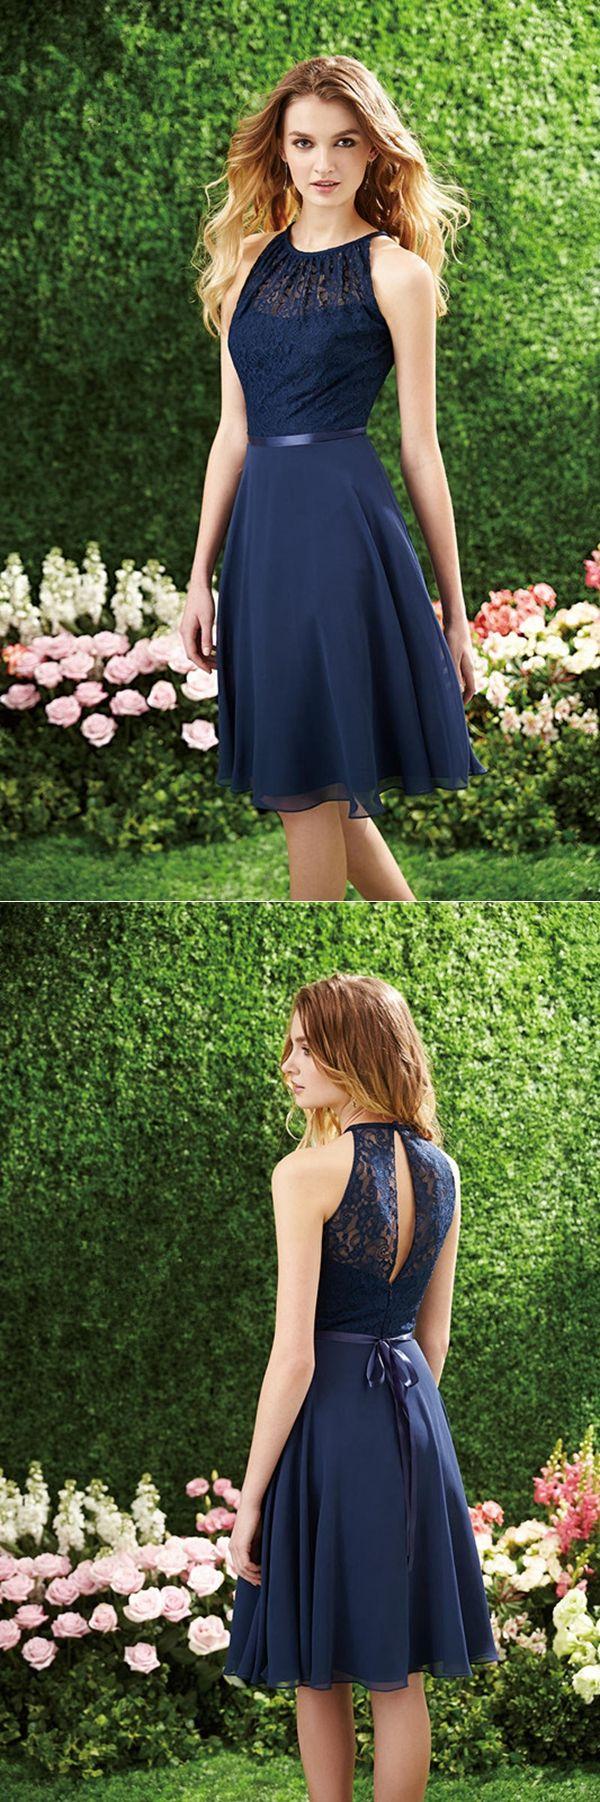 Navy Blue Lace Bodice A-line Knee Length Chiffon Bridesmaid Dress with Ribbon